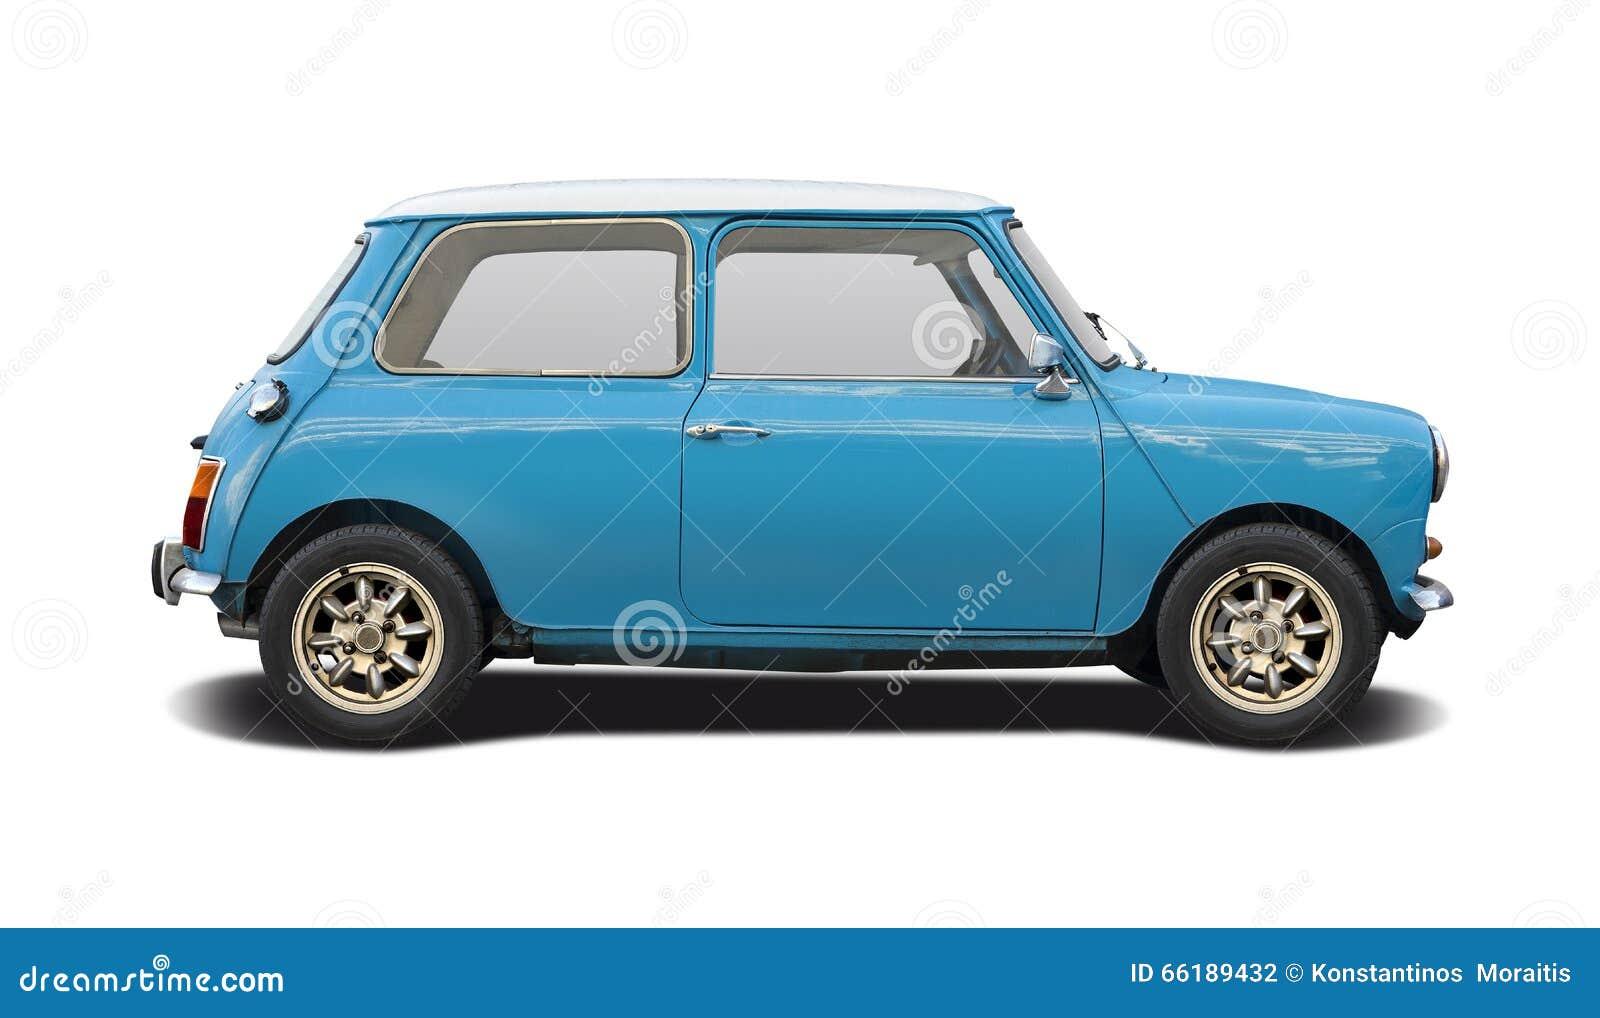 1977 LEYLAND CARS MINI CLUBMAN 1100 BLUE  Old Blue Mini